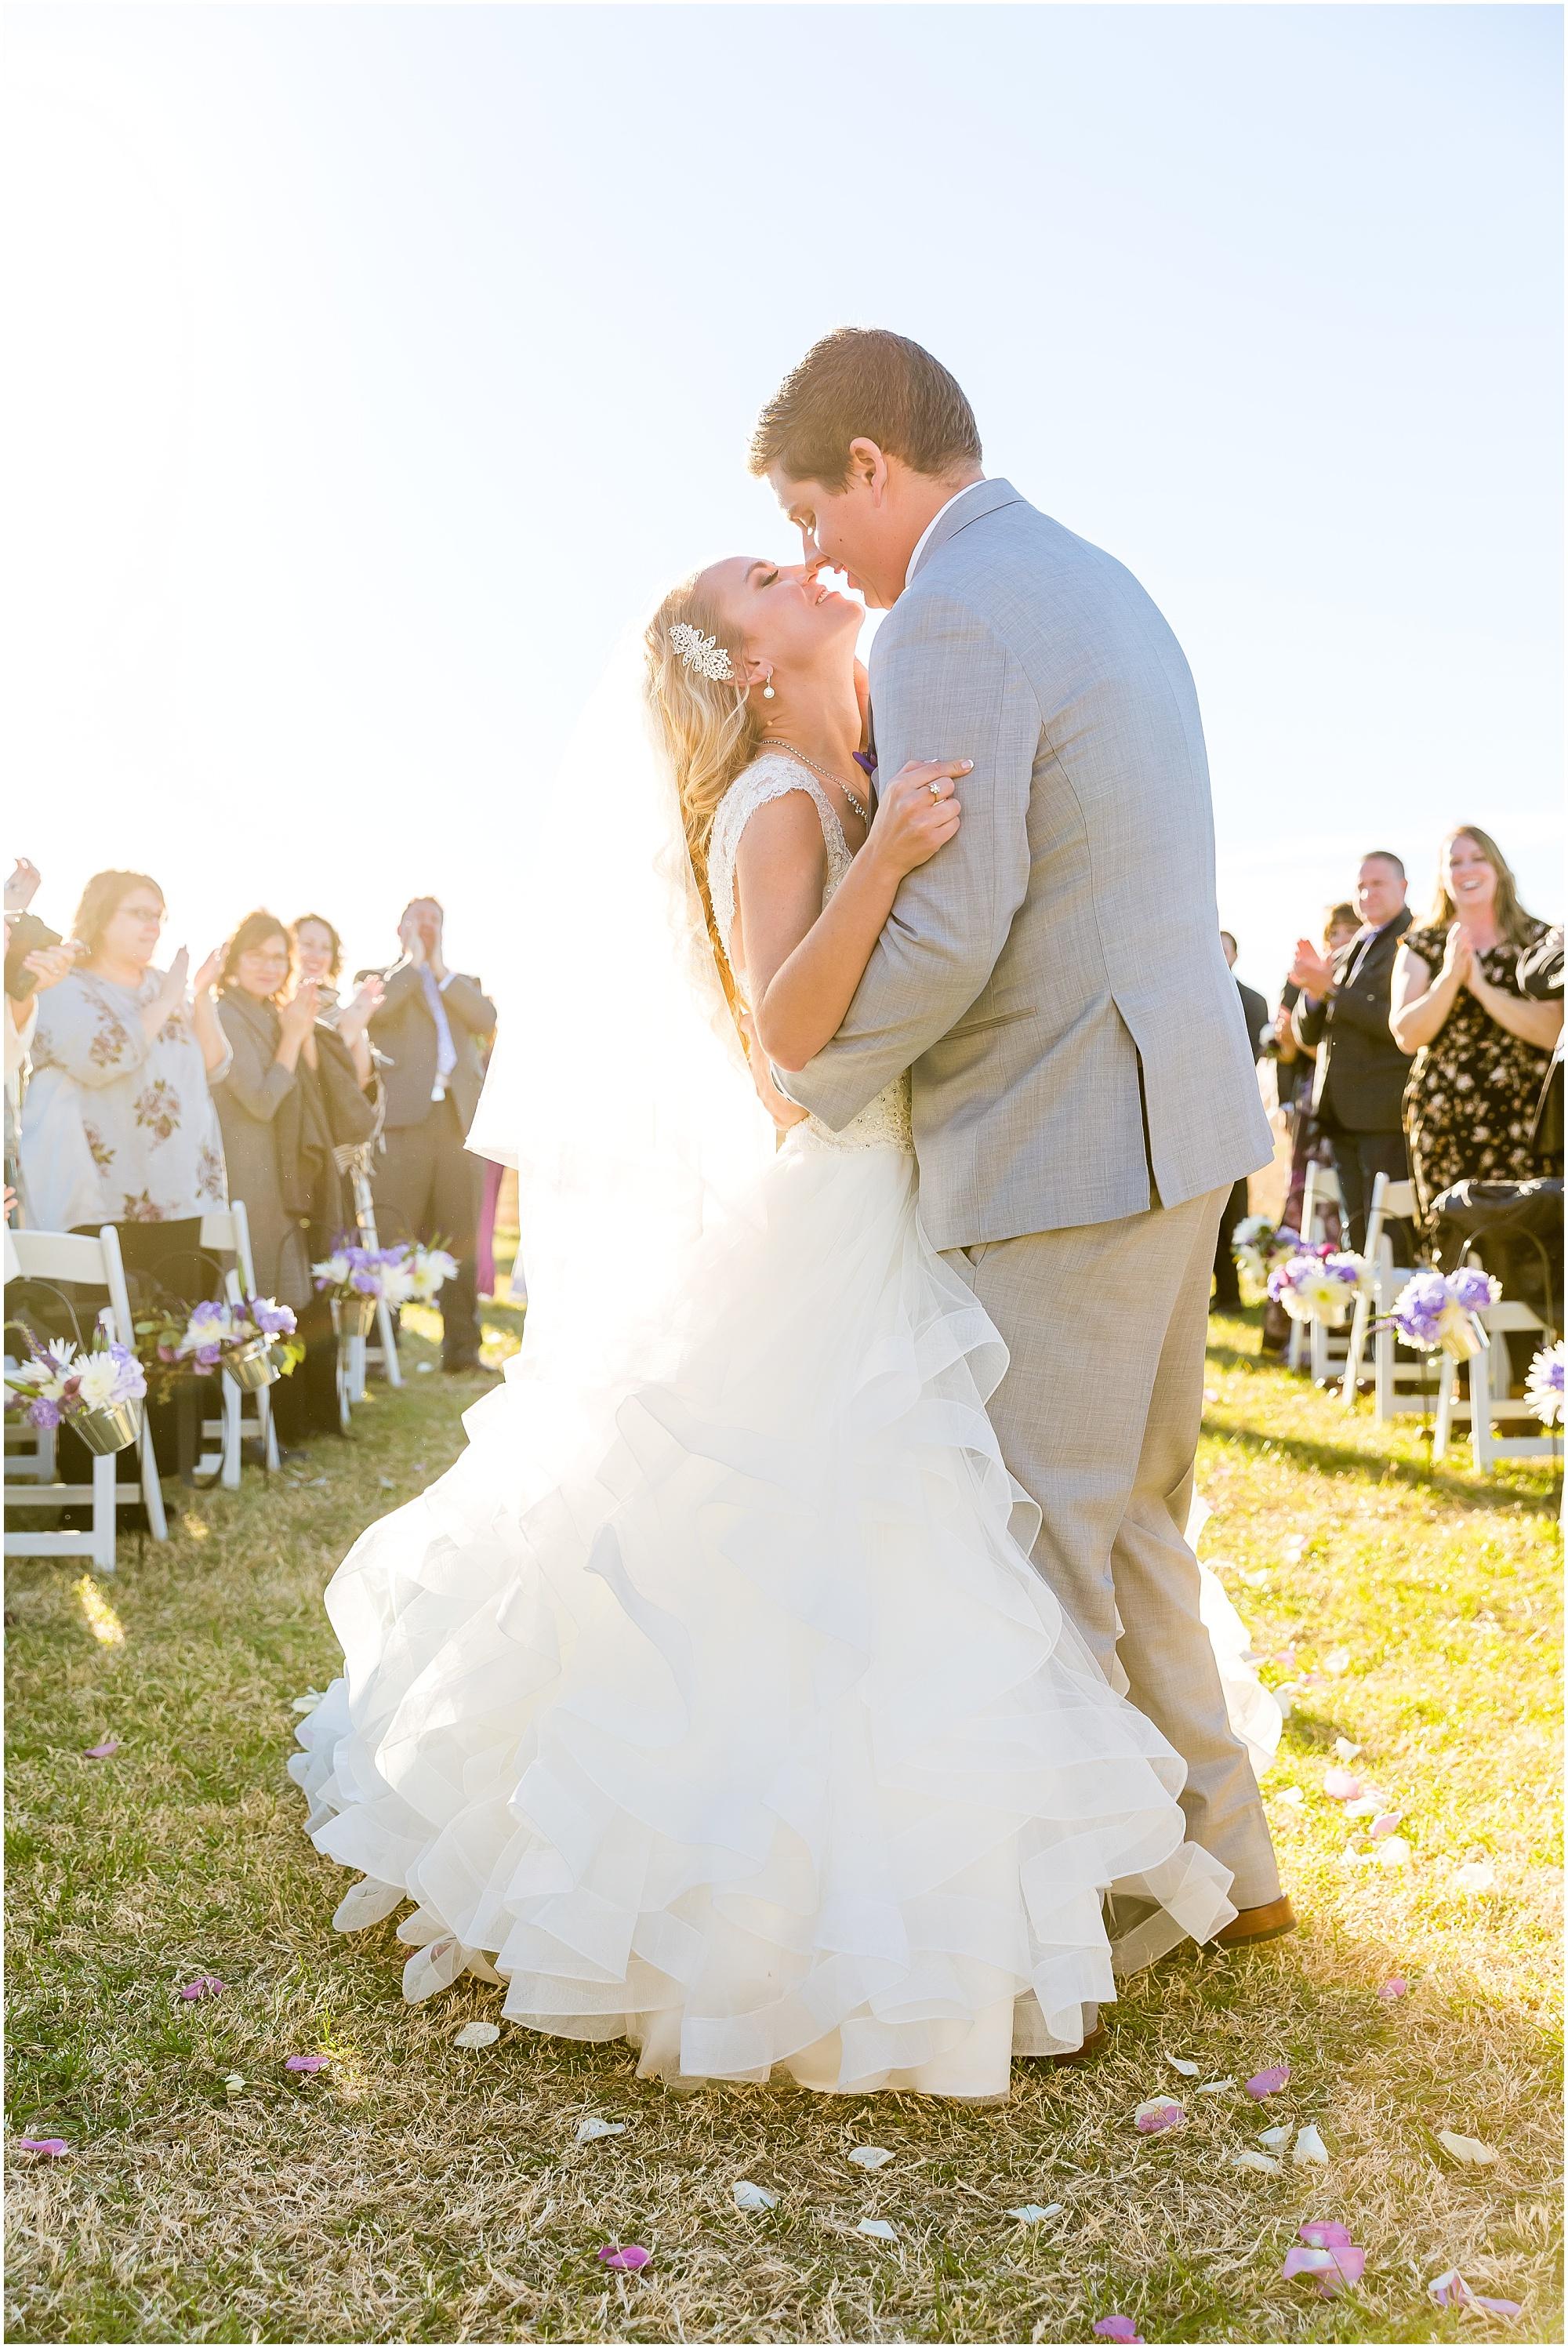 Disney-Inspired-Wedding-Central-Texas_0045.jpg